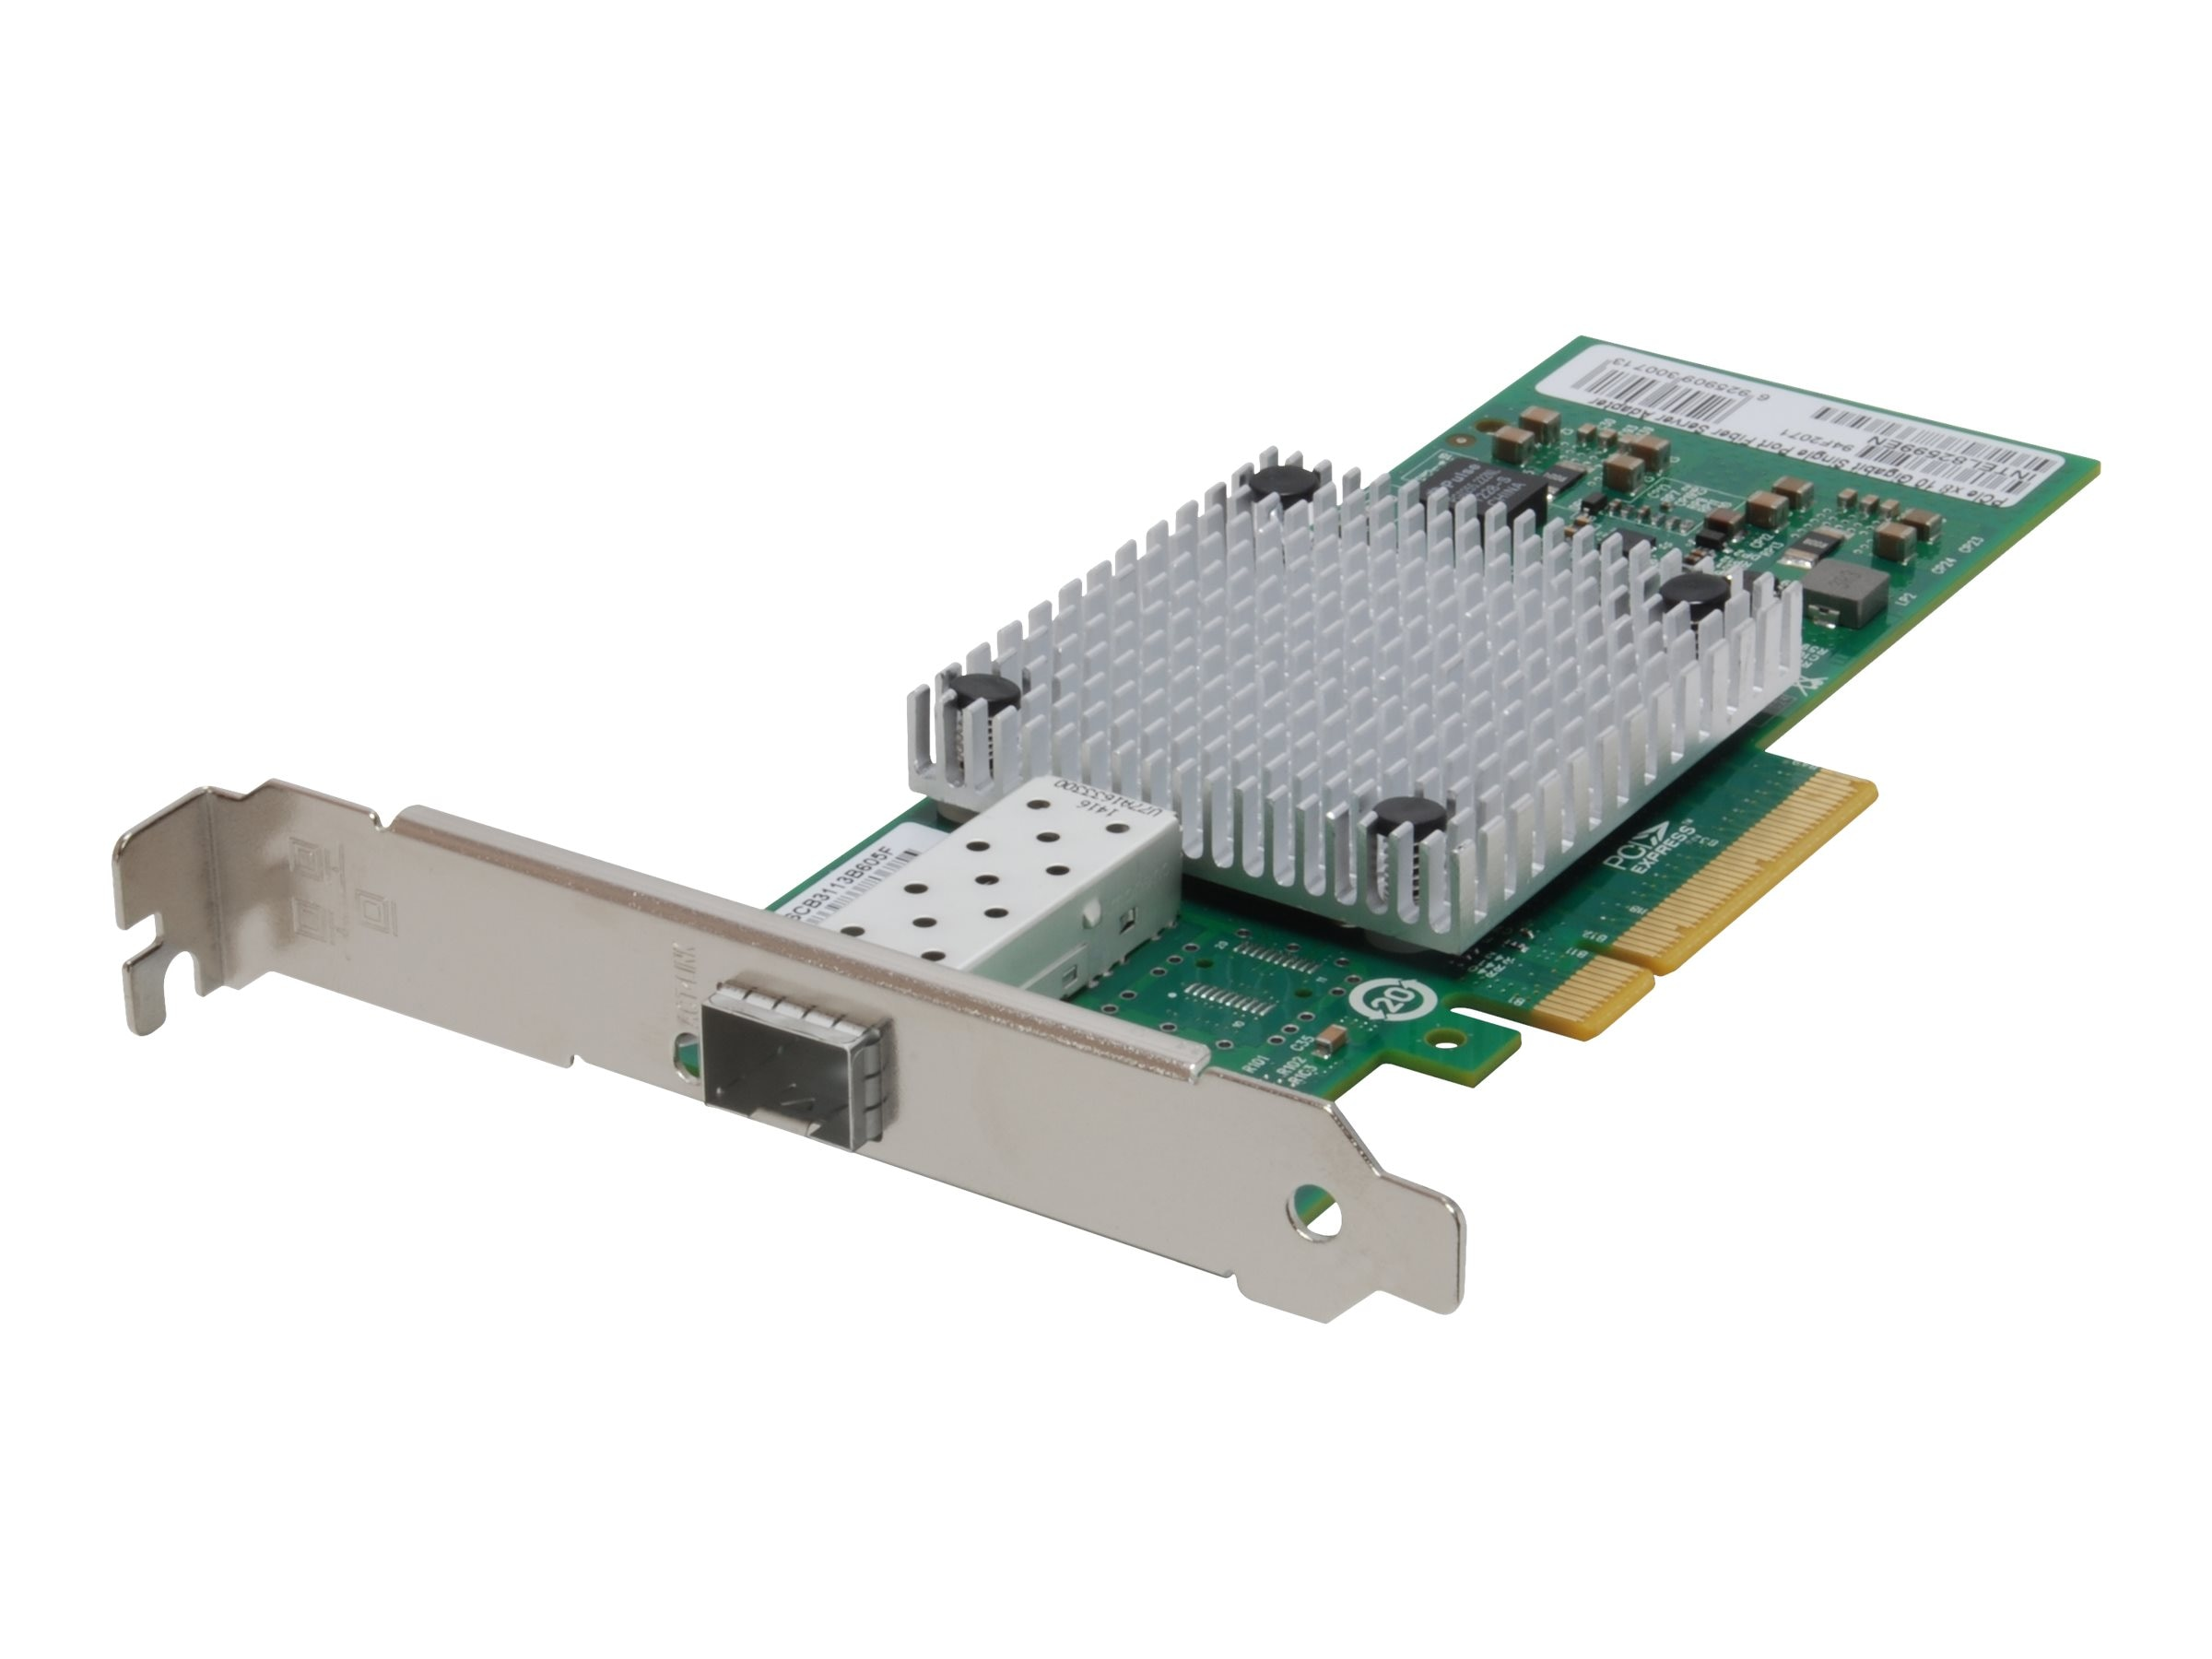 CP Technologies 10 Gigabit Fiber PCIe Network Card, PCIe 8X, 1 x SFP